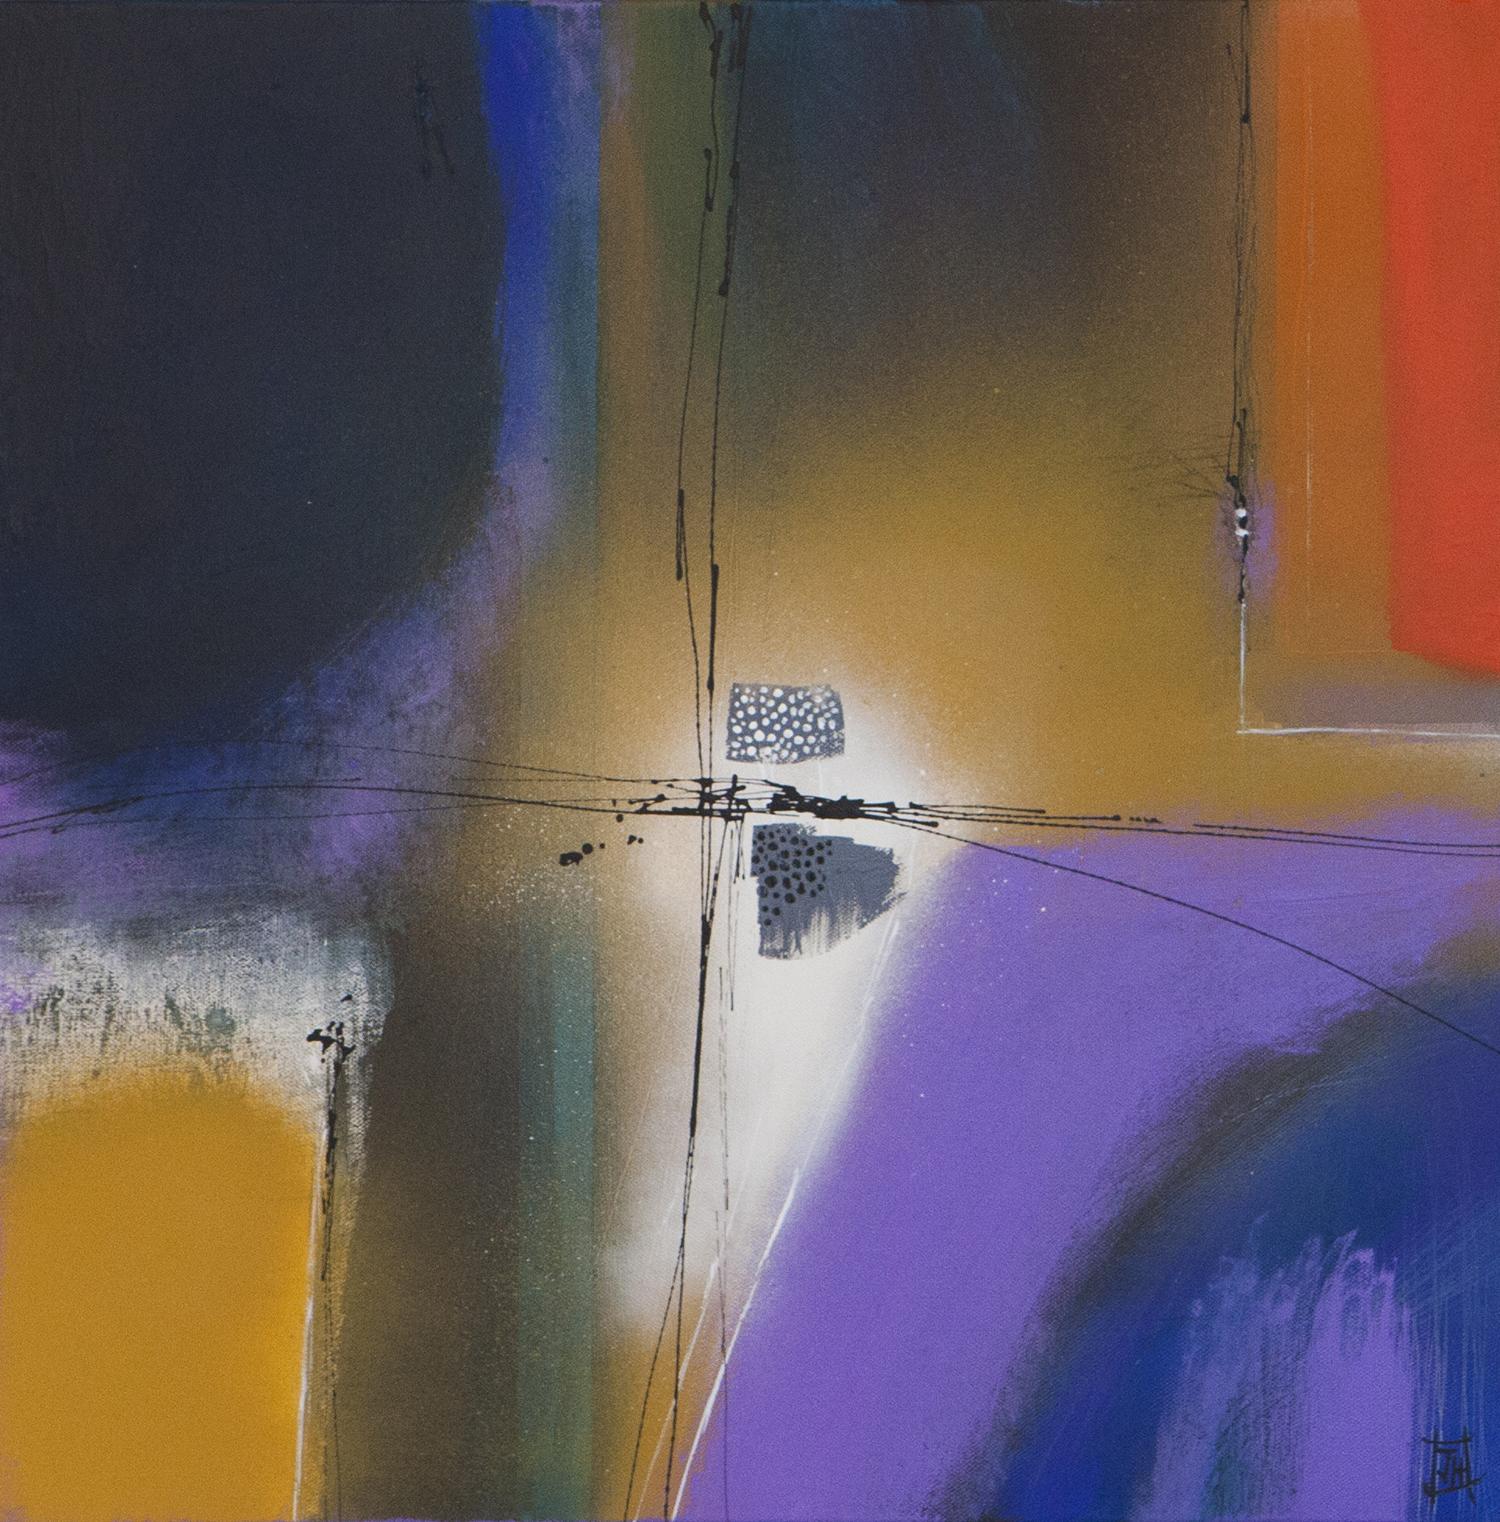 Abstract no6  acrylic on canvas  52cm x 52cm framed  £440